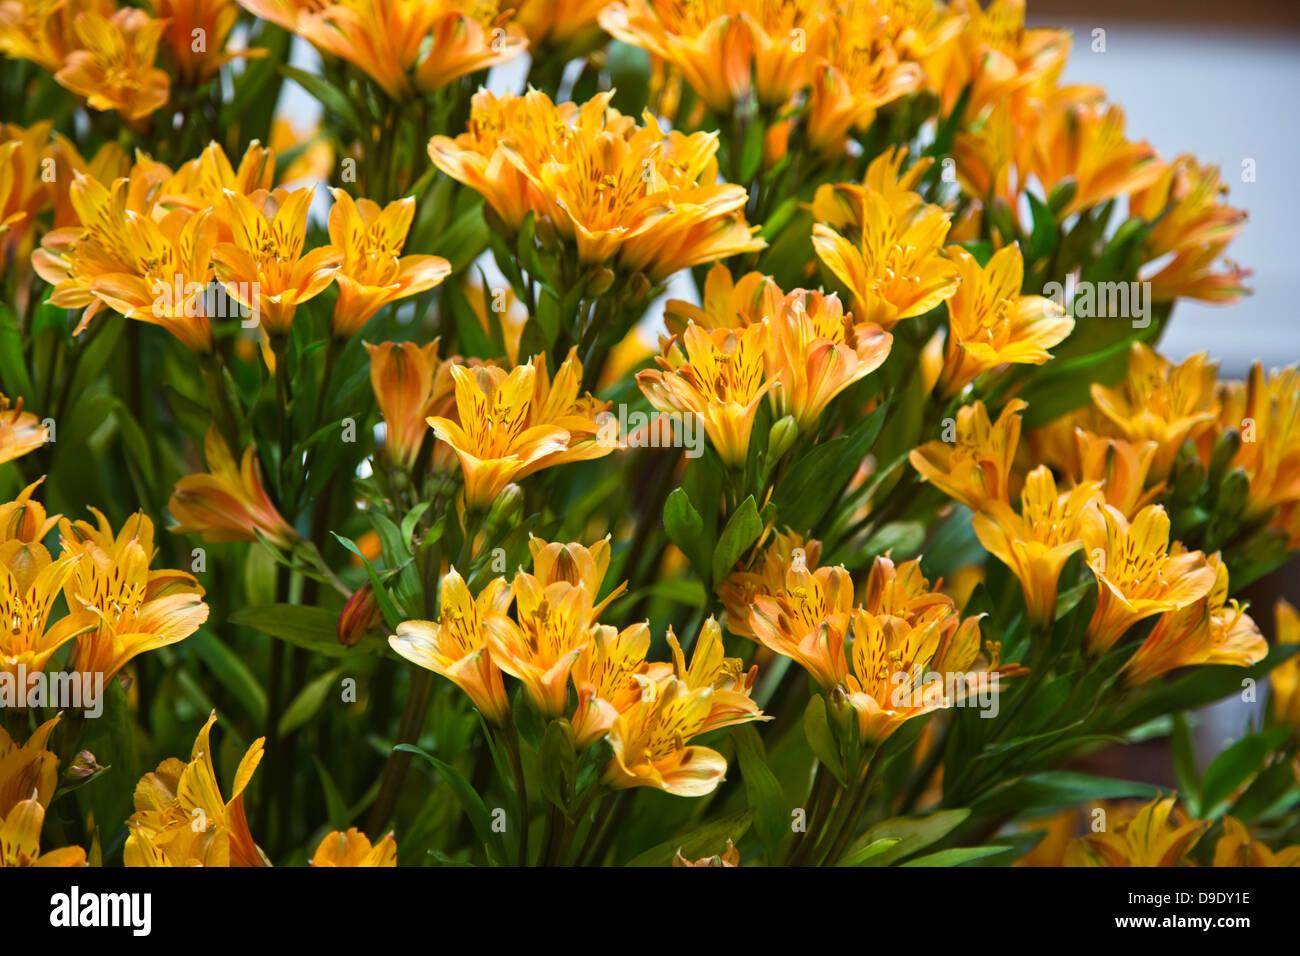 Close-up of flowers, Shimla, Himachal Pradesh, India - Stock Image